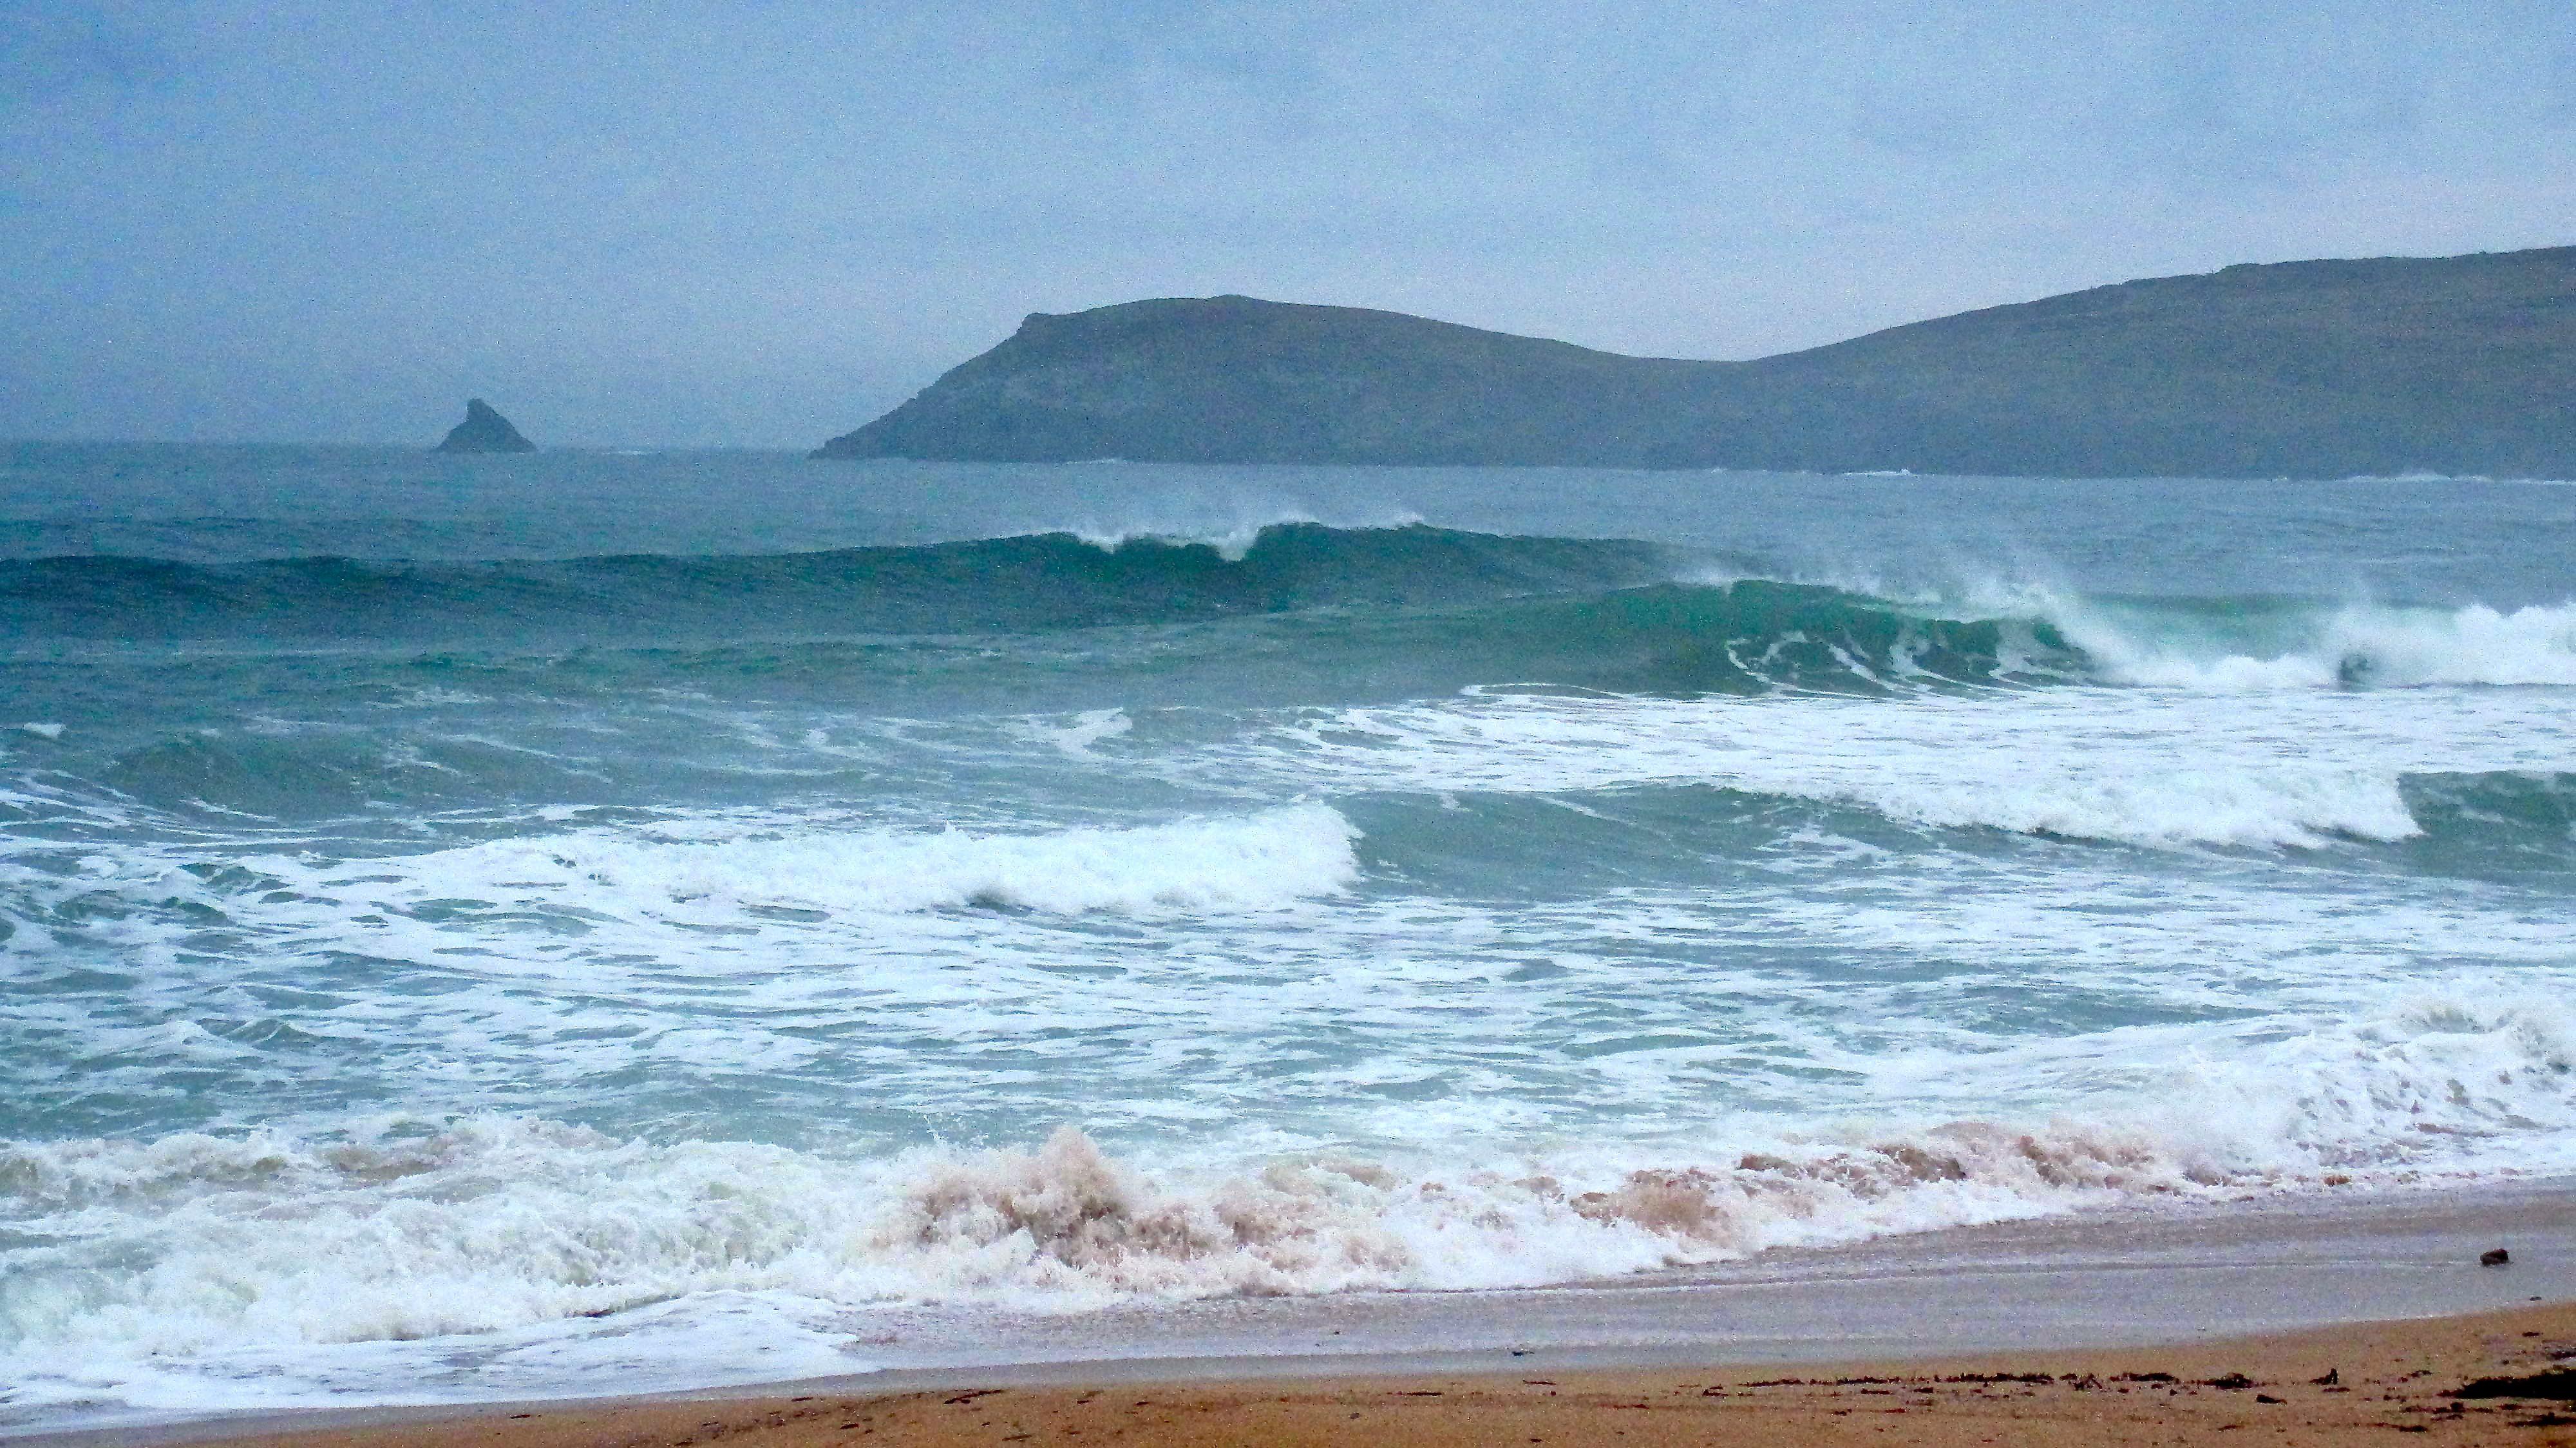 Surf Report for Sunday 28th September 2014